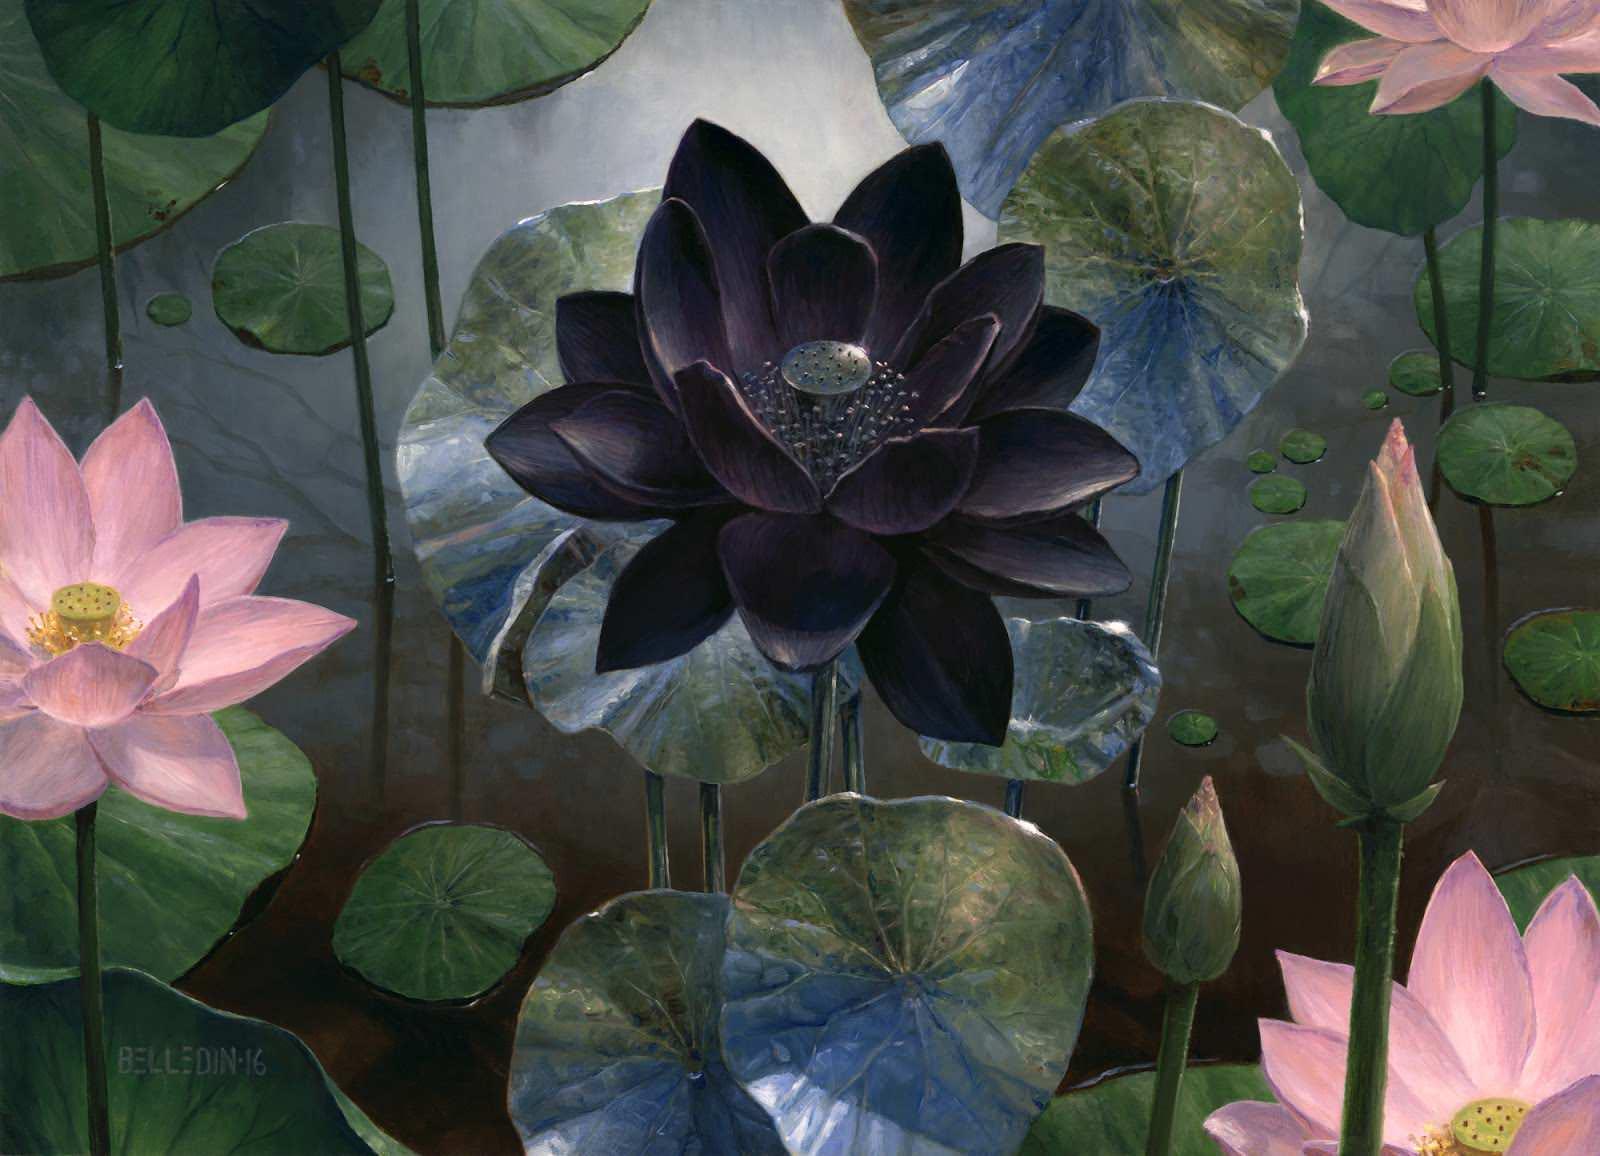 Steven Belledin S Black Lotus Mtg Black Lotus Art 2056912 Hd Wallpaper Backgrounds Download